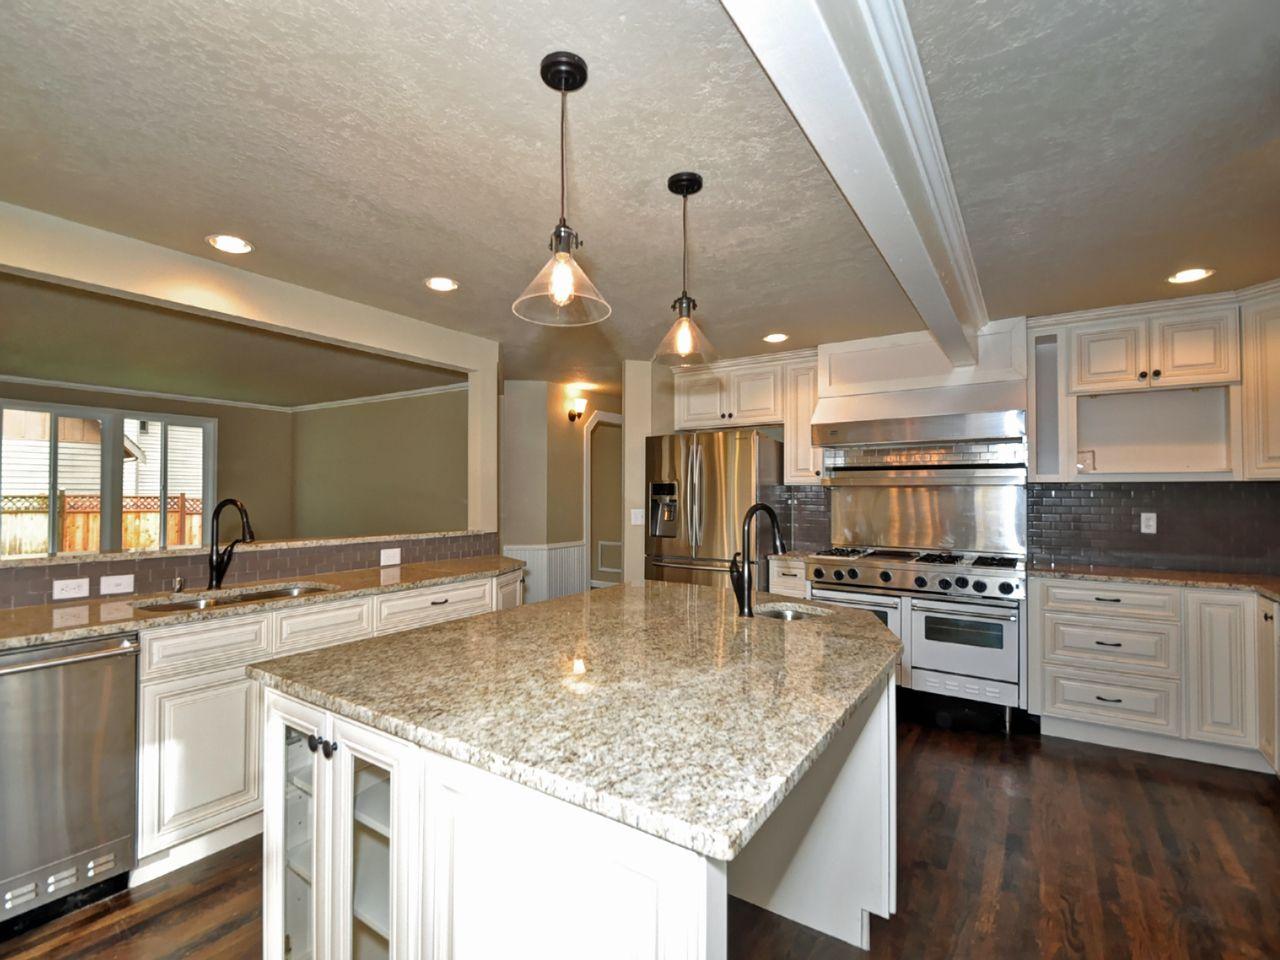 Charleston Saddle Lily Ann Cabinets Charleston Antique White Antique White Kitchen Antique White Kitchen Cabinets White Kitchen Cabinets